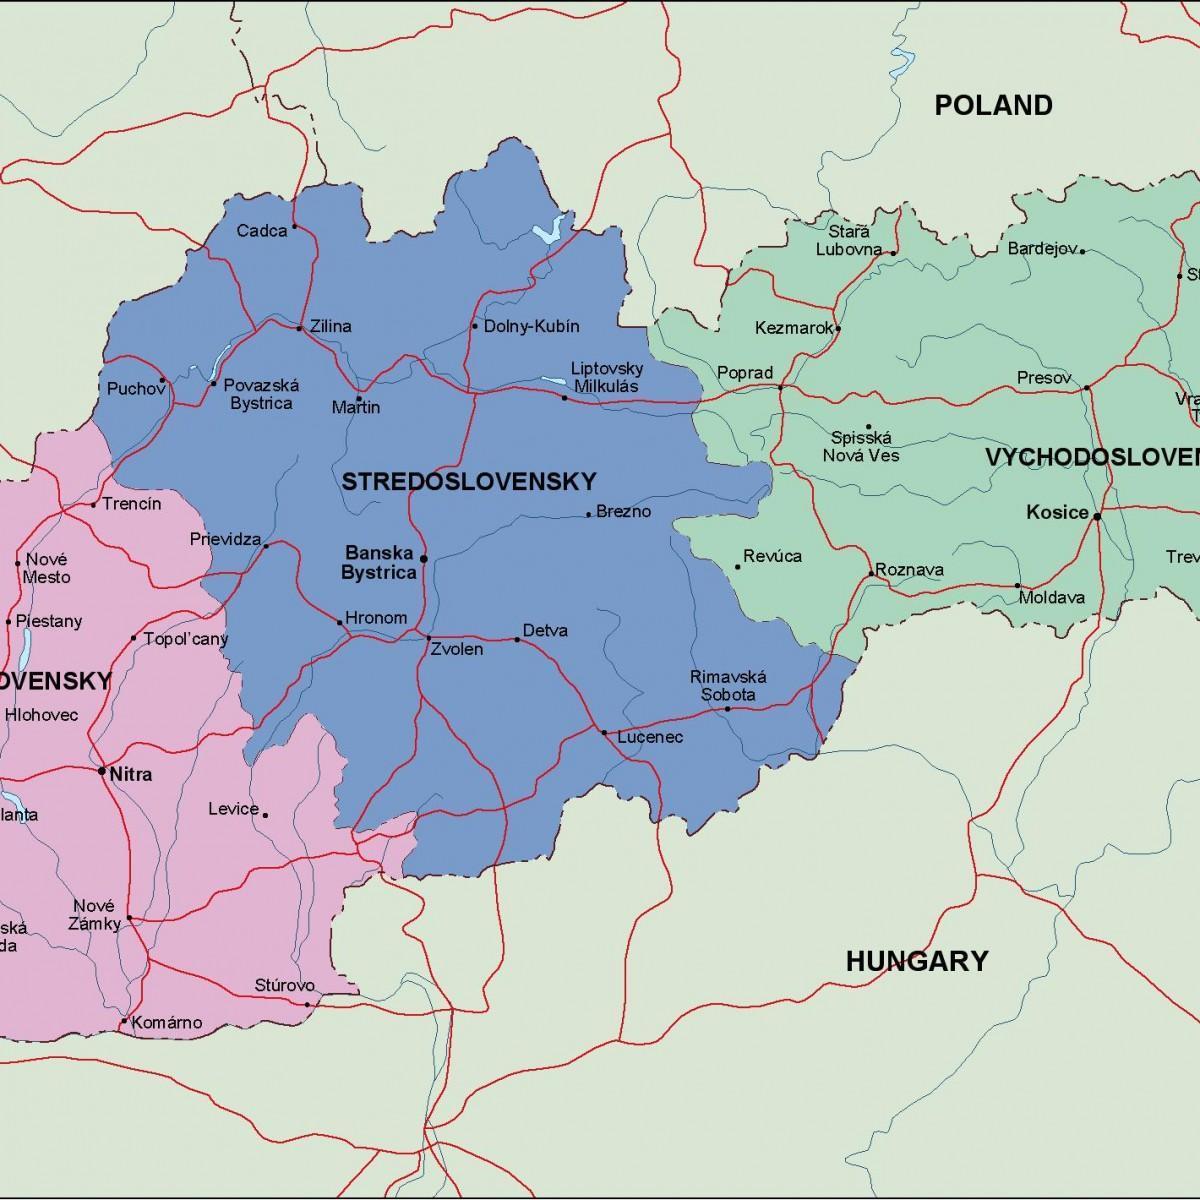 Slovacke Politicki Mapu Mapa Slovacke Politicki Istocne Evrope